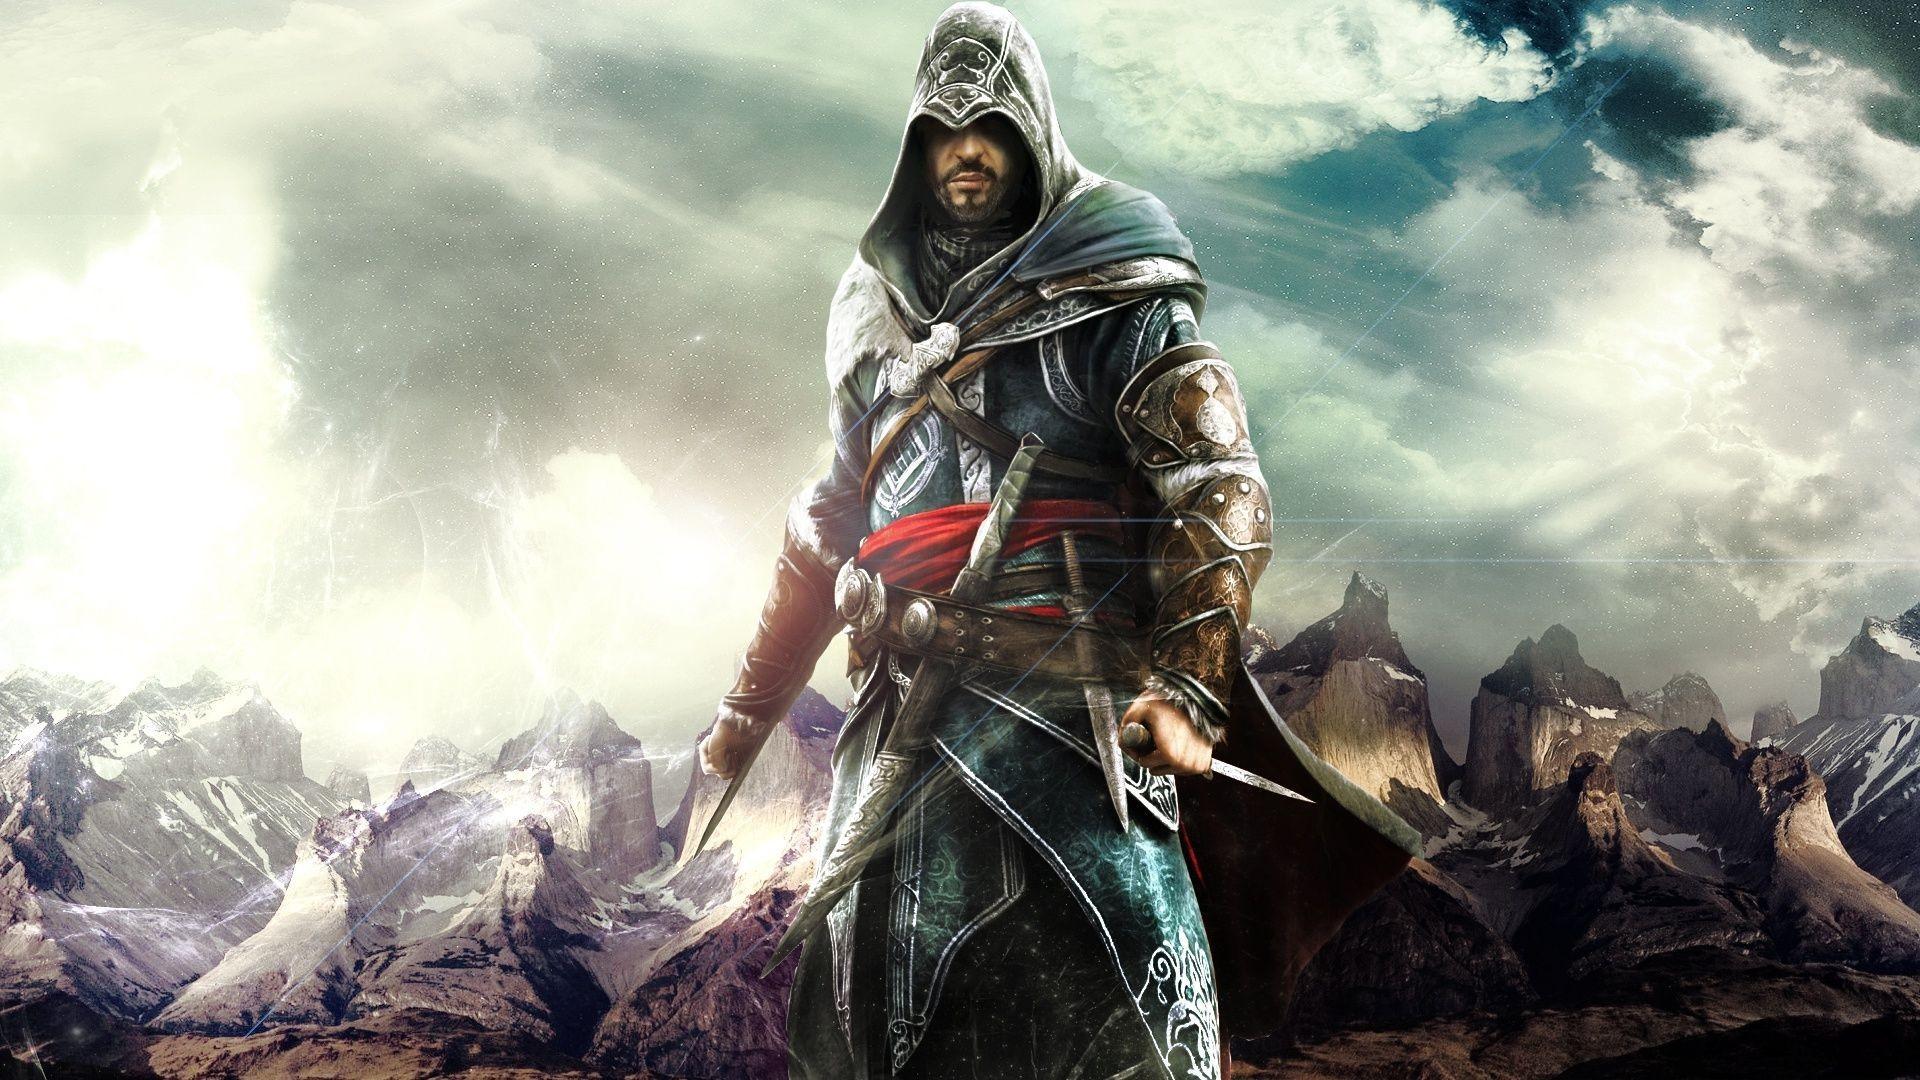 Assassin's Creed: Revelations HD Wallpaper 1920×1080